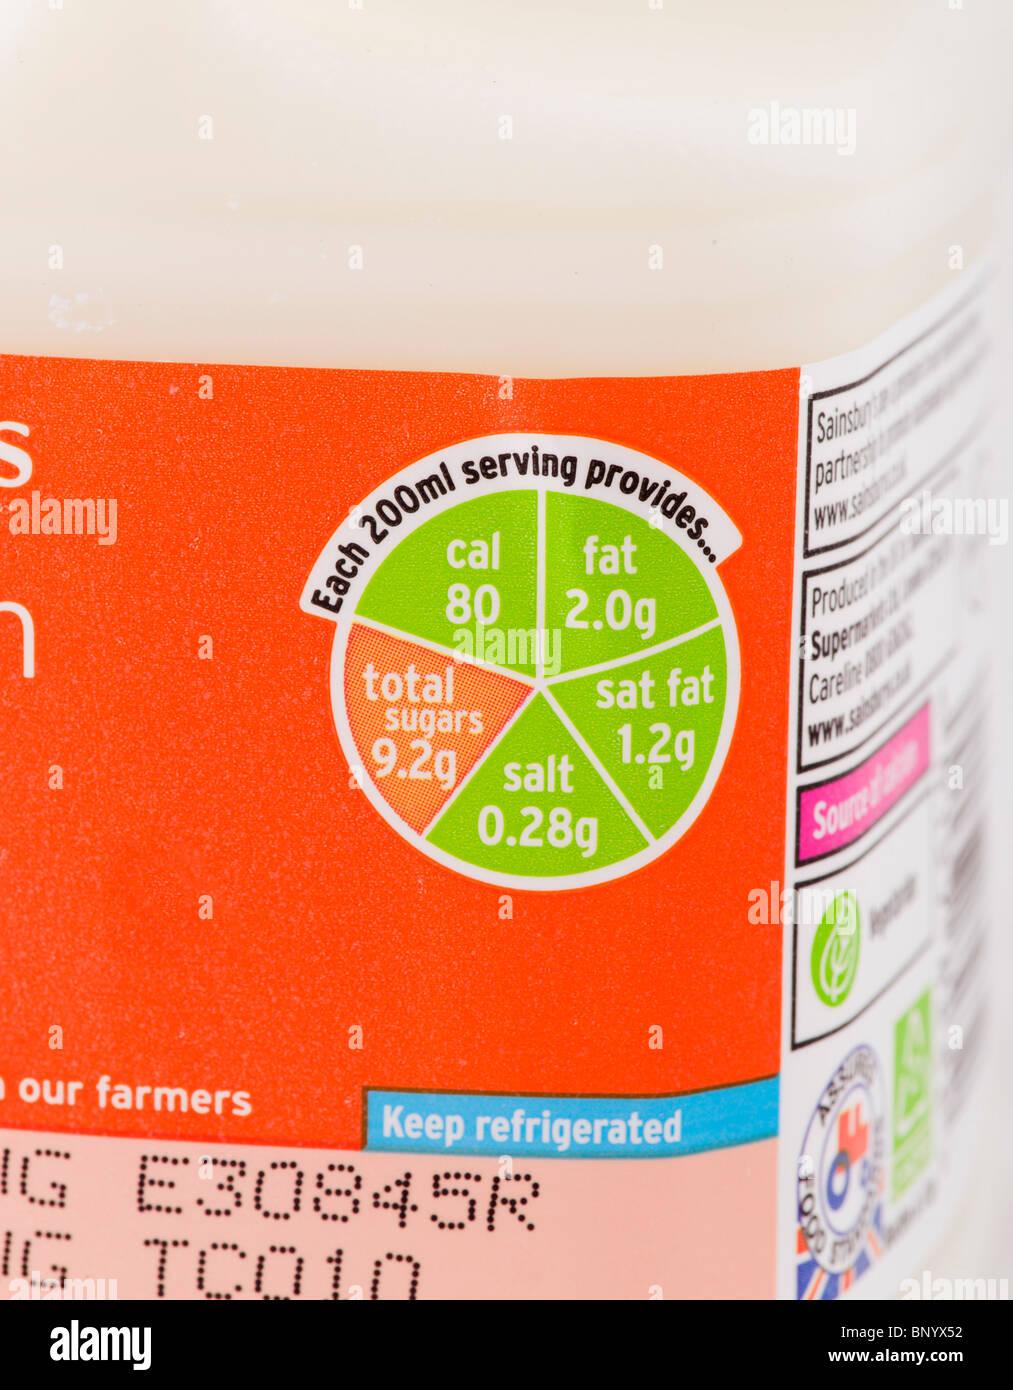 'Traffic Light' label on a carton of Sainsbury's low fat milk - Stock Image